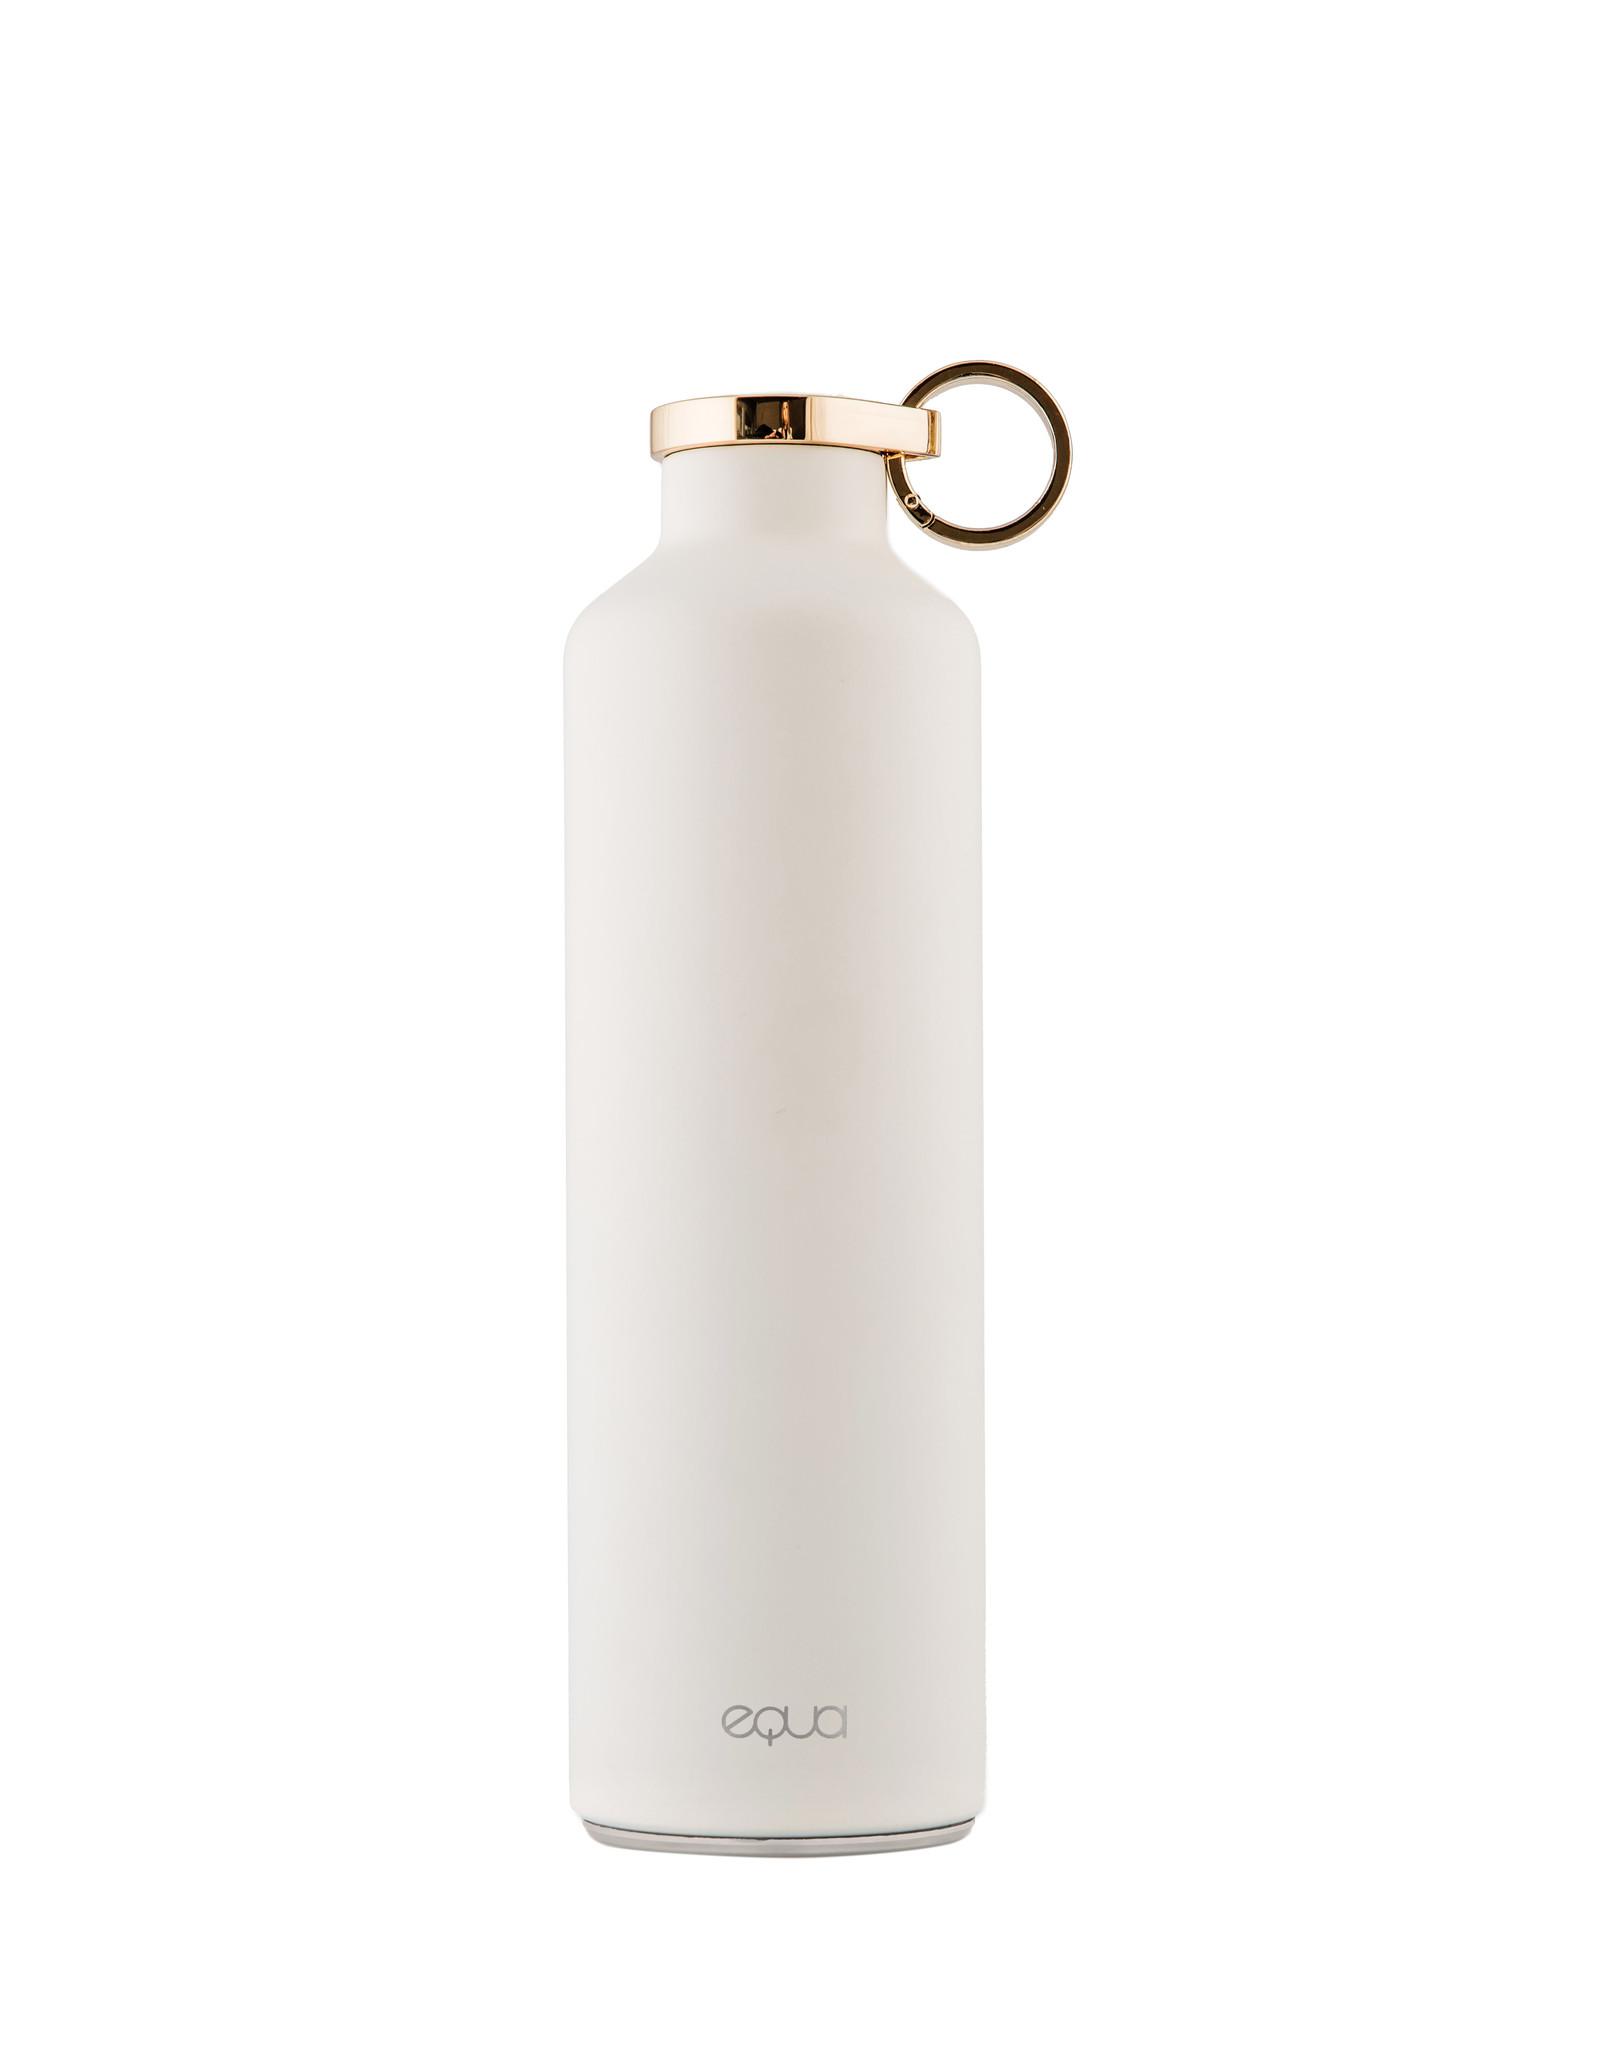 Equa RVS drinkbus - Snow white 680 ml